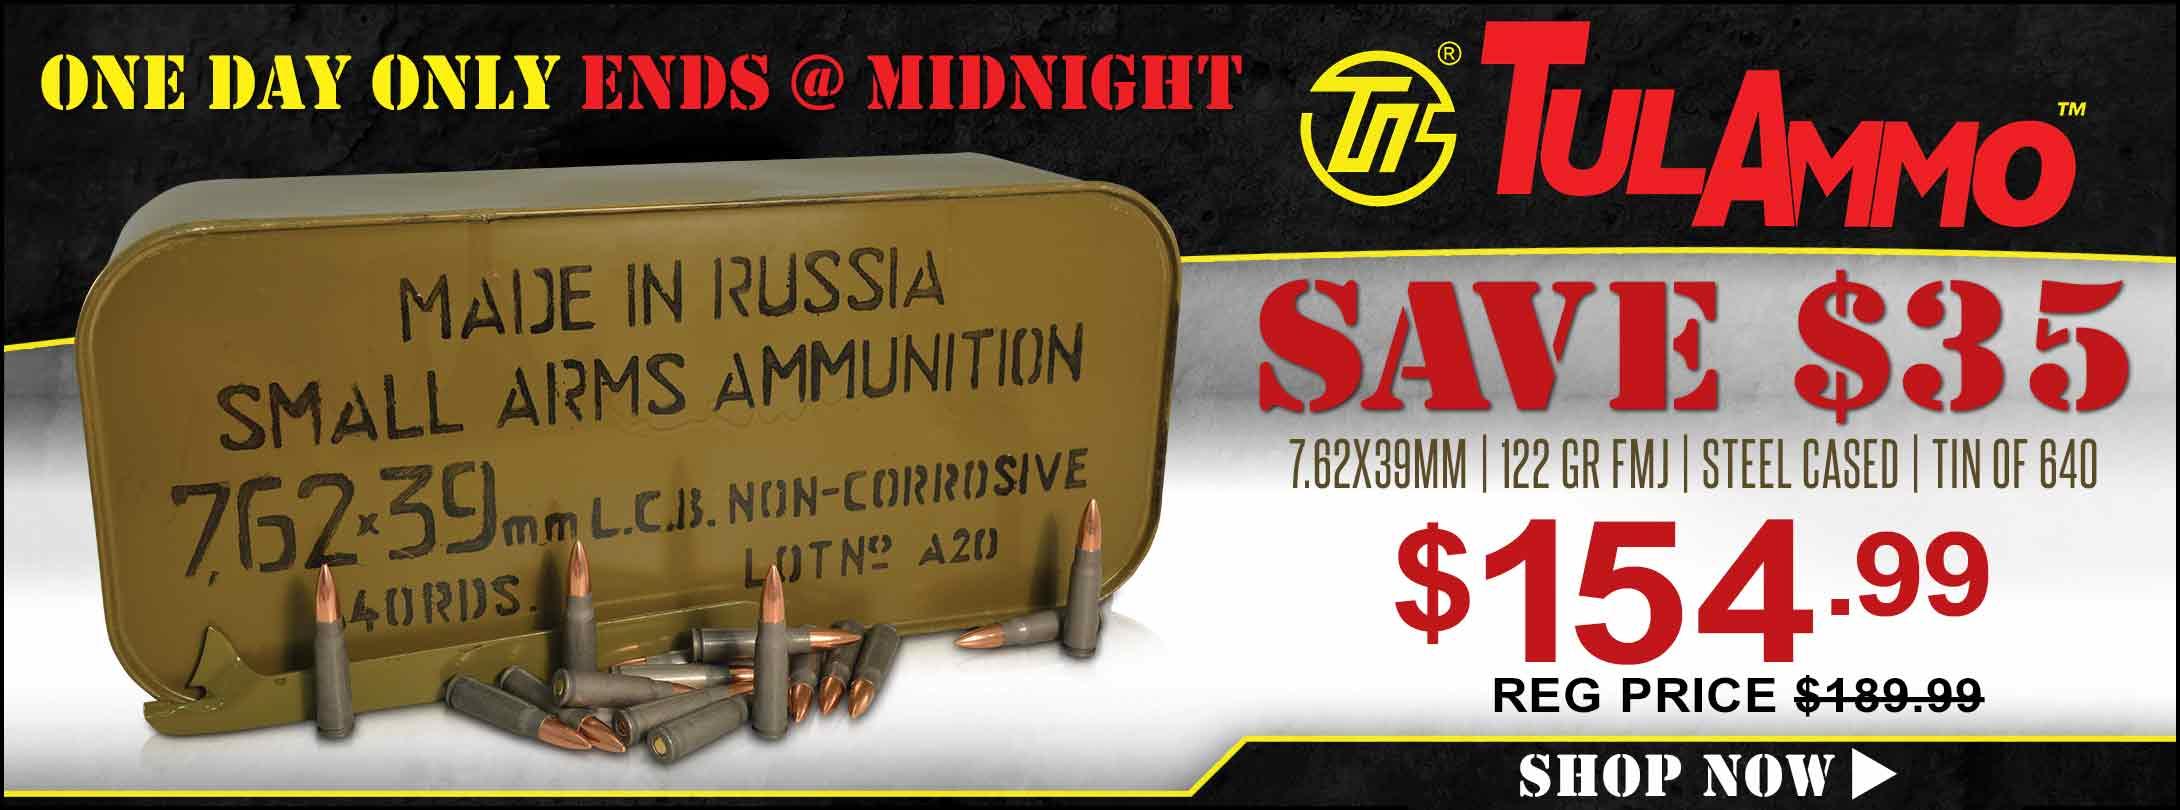 Save On TulAmmo 7.62x39mm!